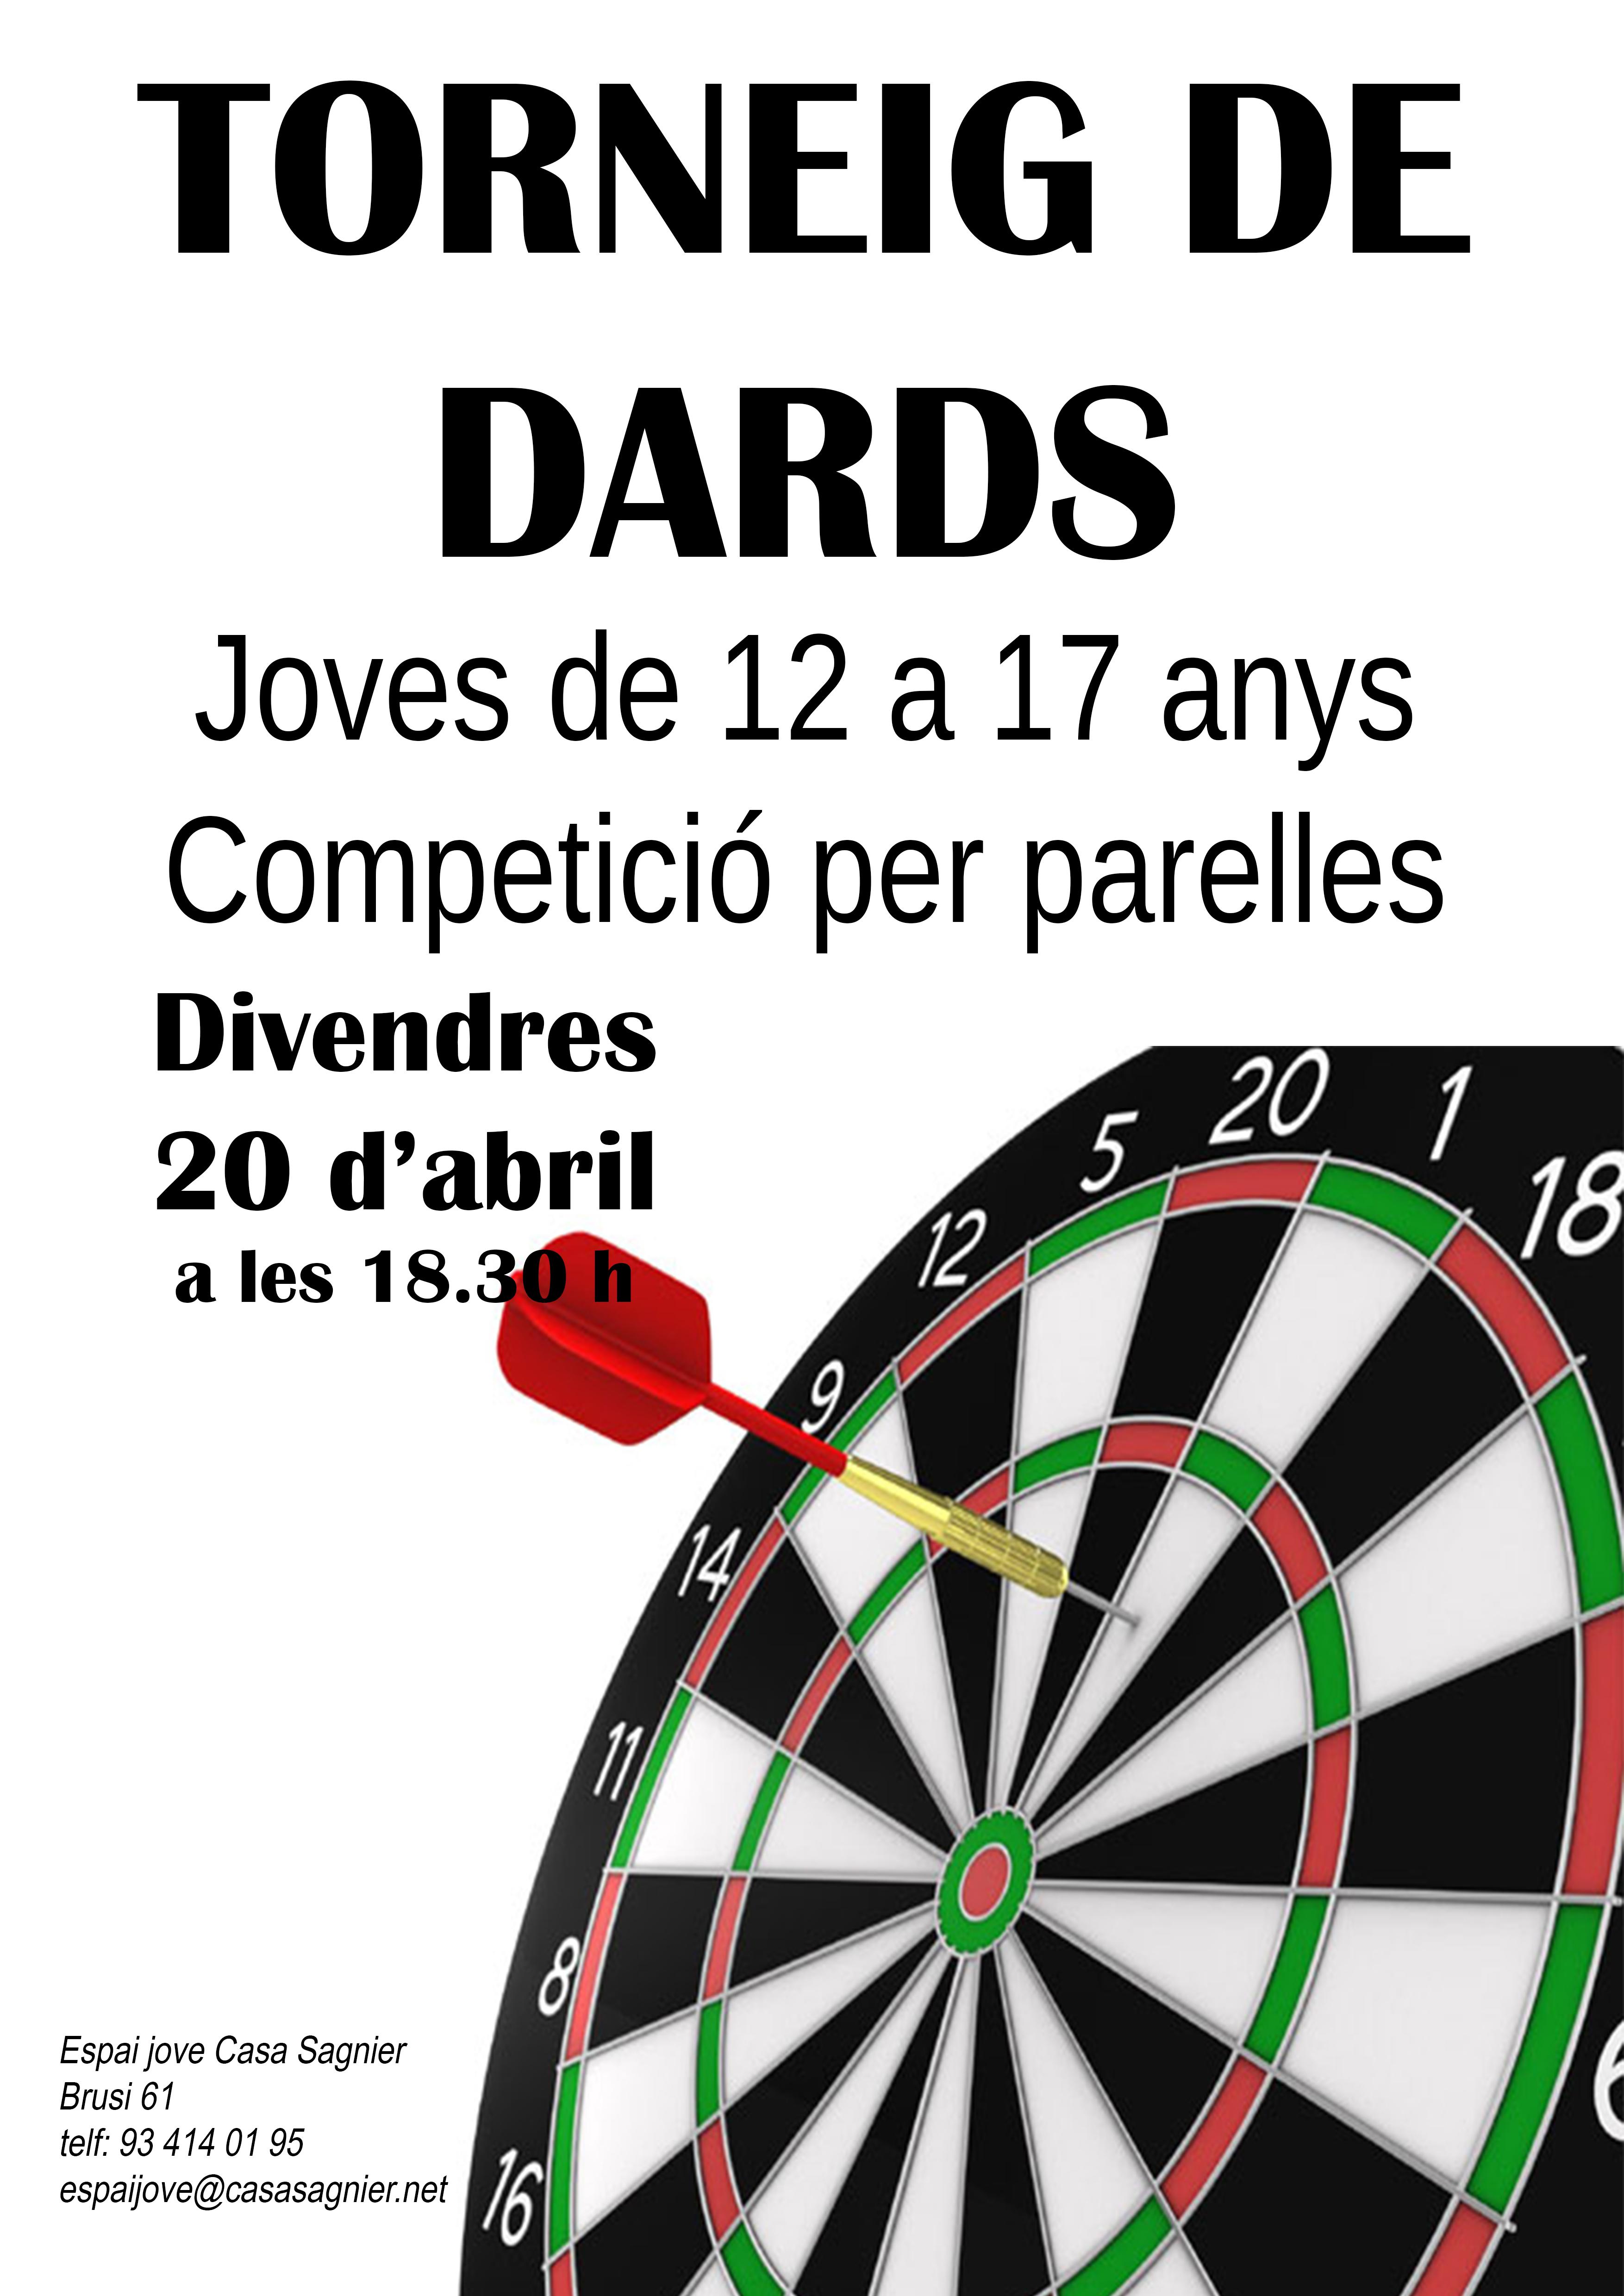 torneig dards